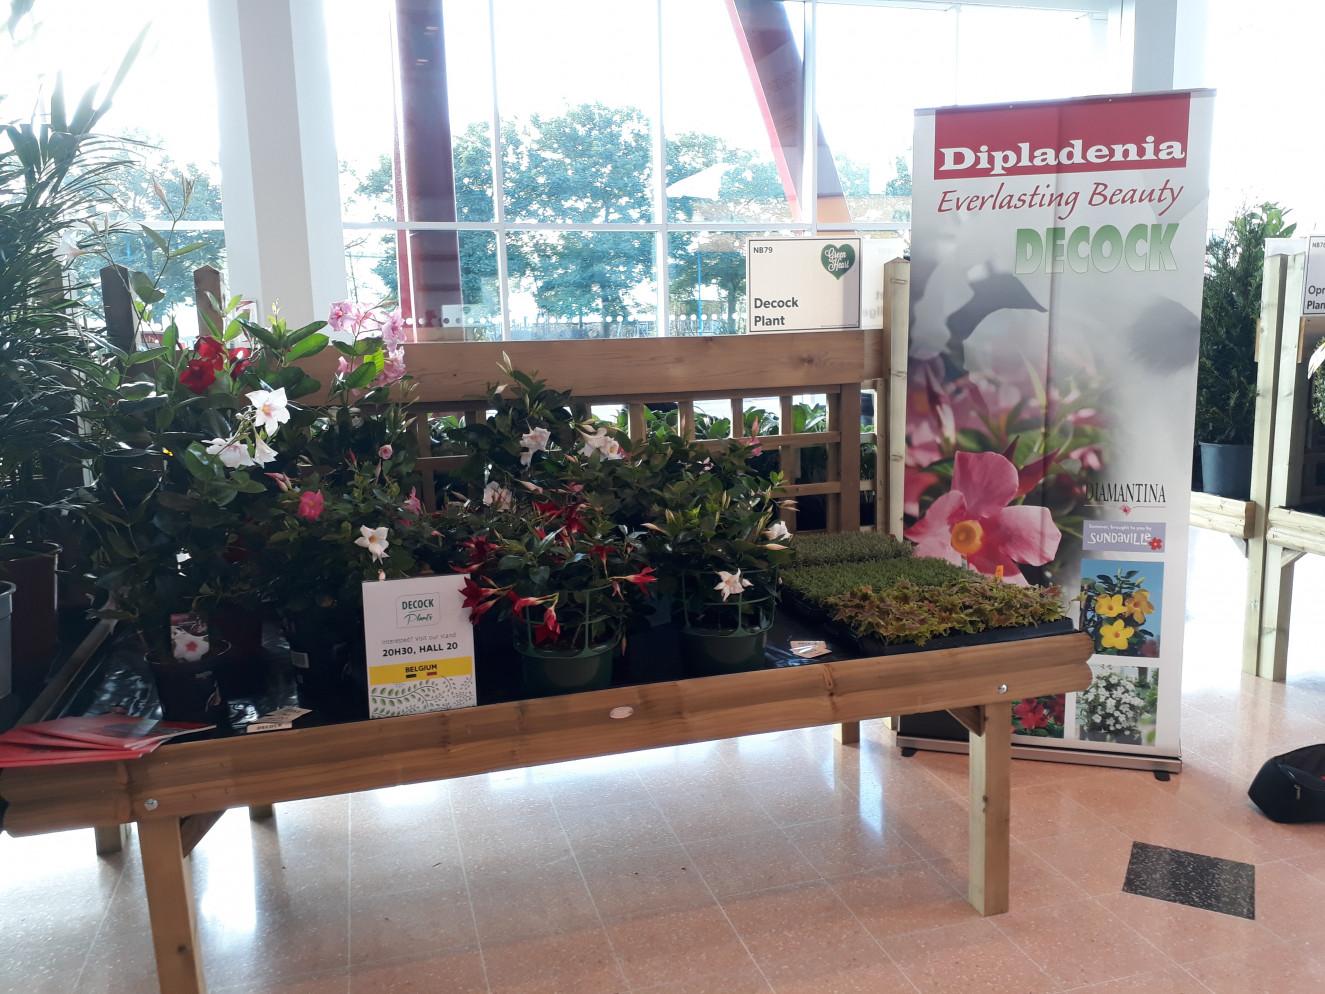 Decock Plants Glee1.jpg